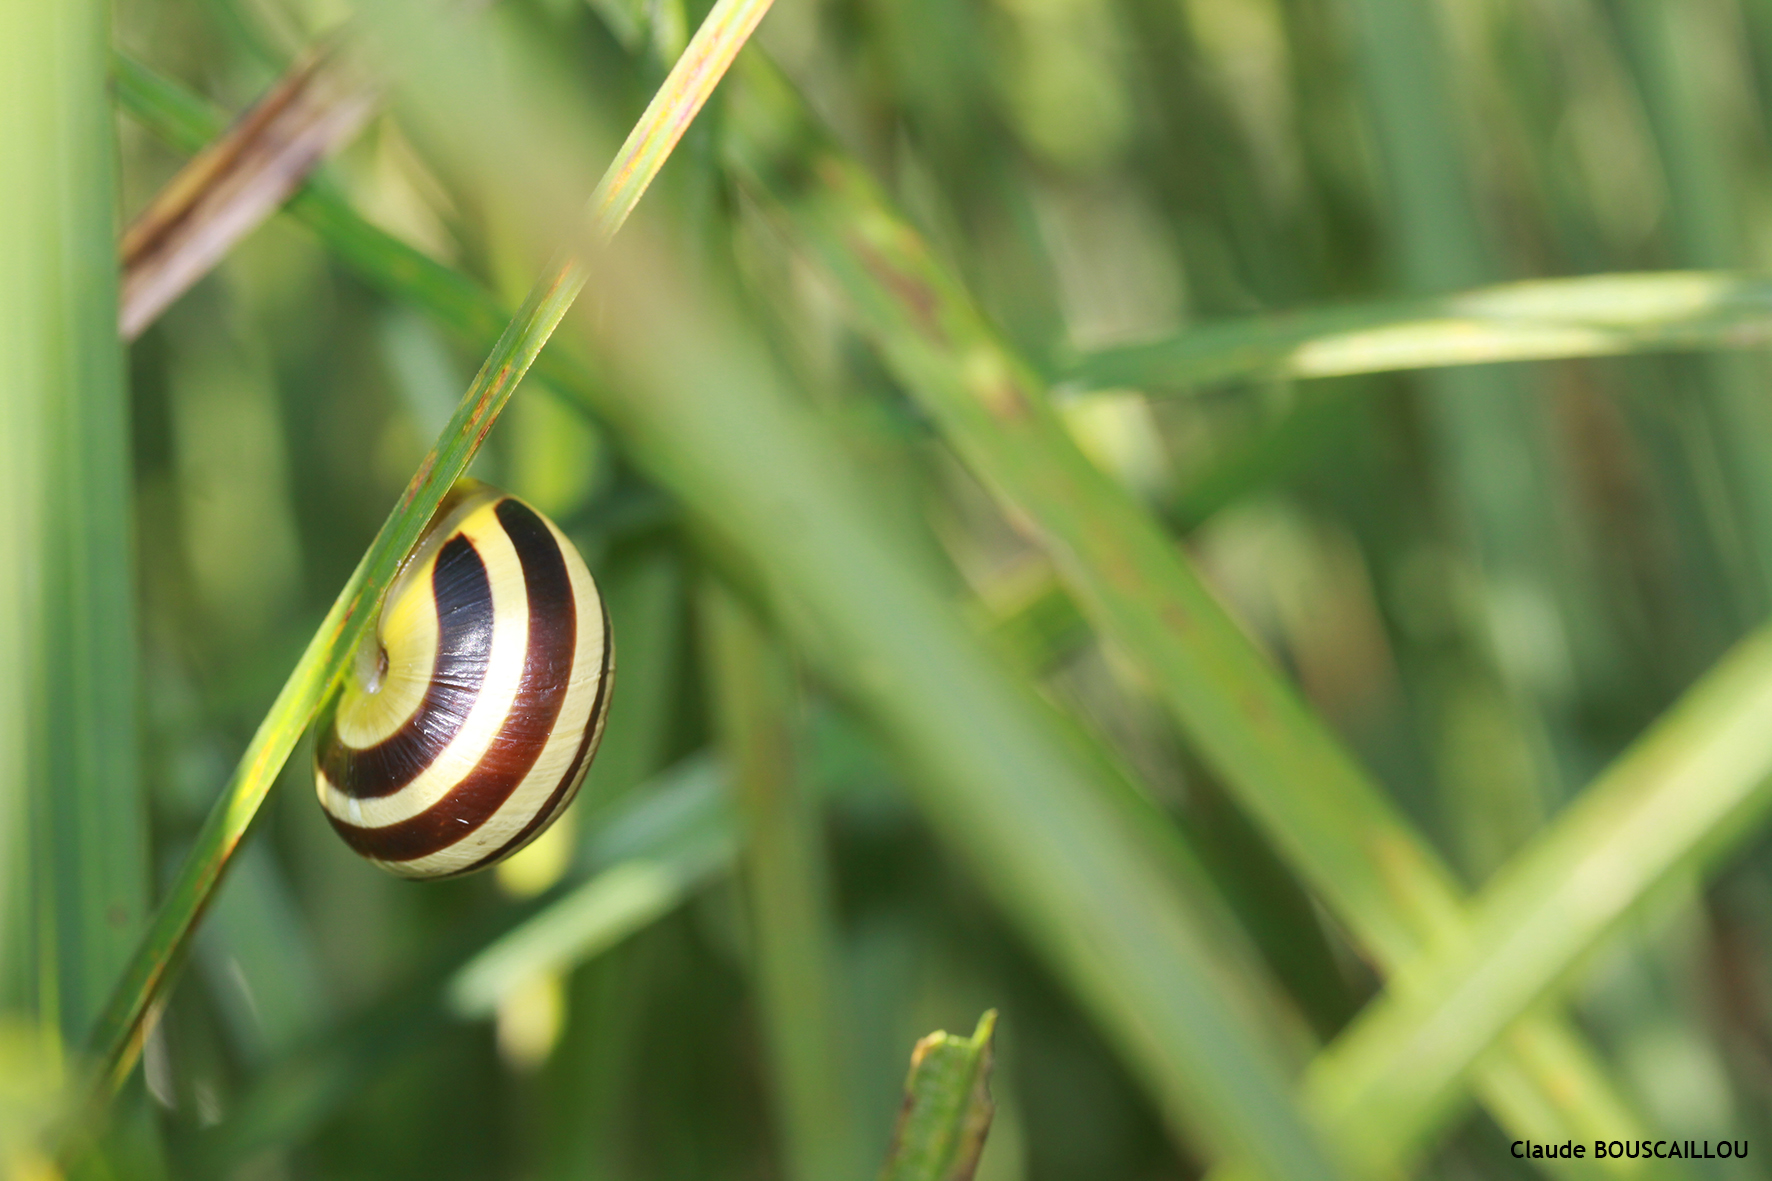 https://cdnfiles2.biolovision.net/www.faunegeneve.ch/userfiles/gasteros/Escargotdesjardins-Cepaeahortensis.jpg